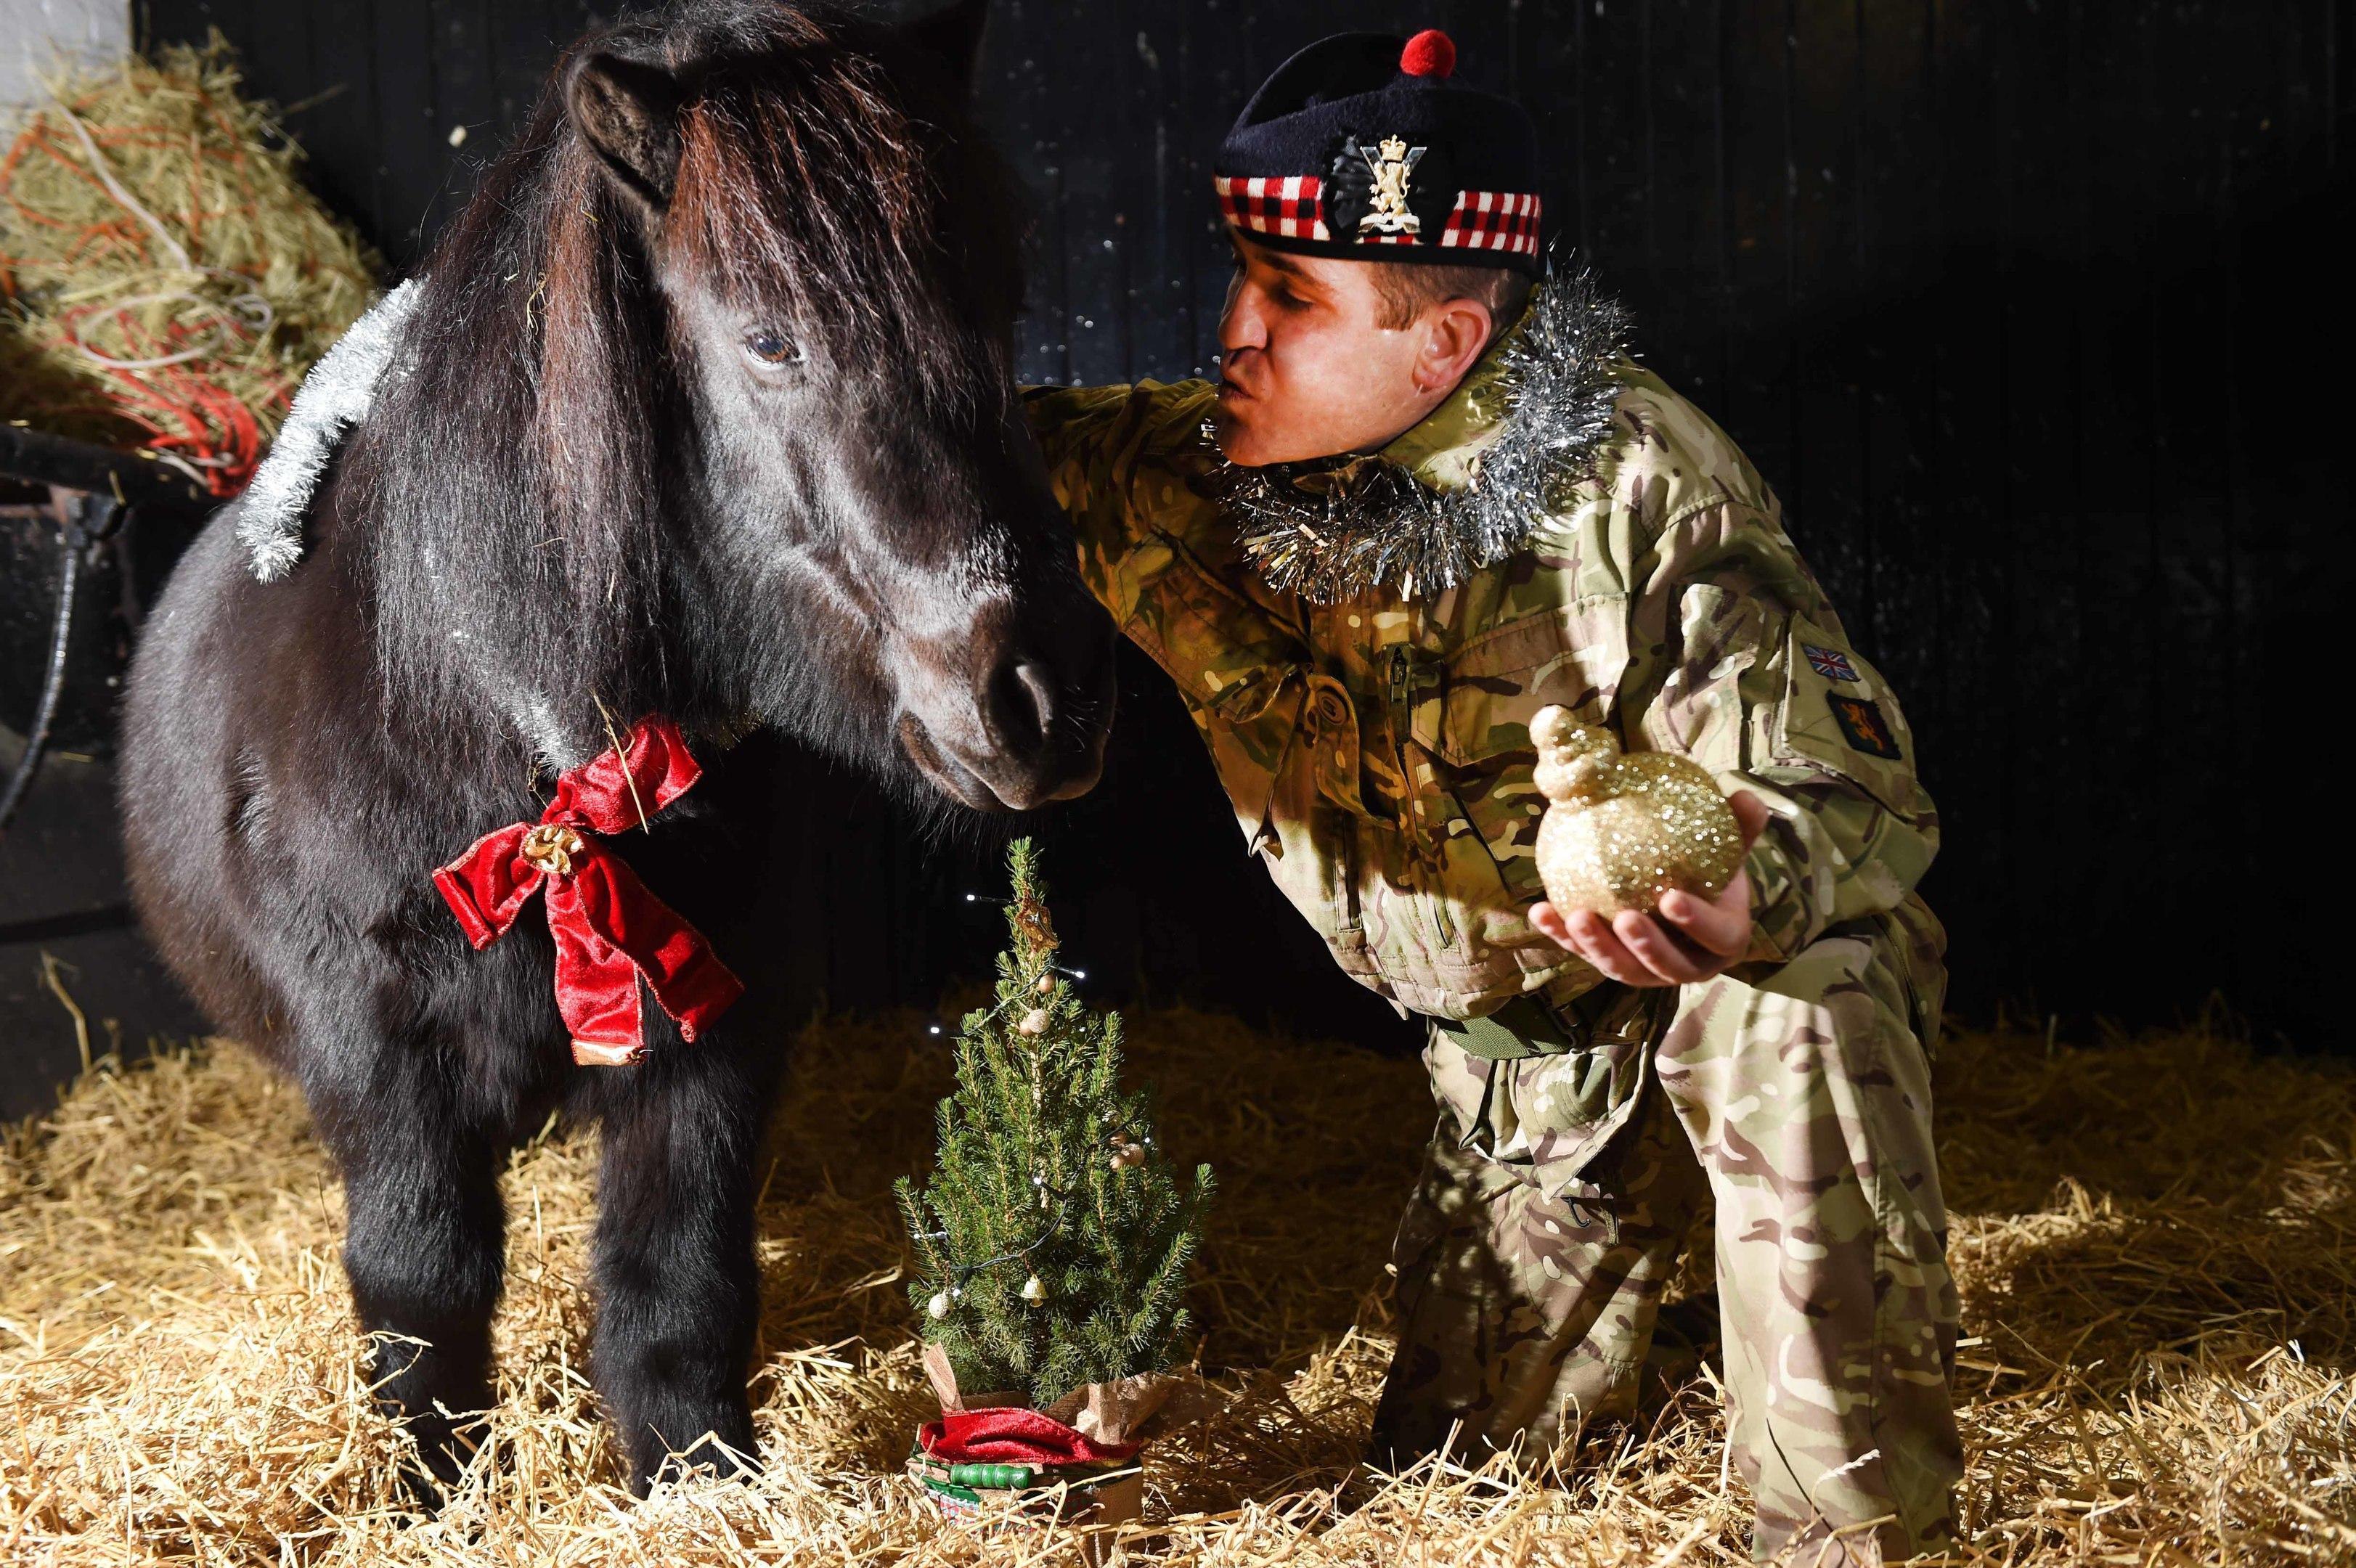 Private Colin Fotheringham and Cruachan IV enjoying the festive season in the pony at Redford Barracks, Edinburgh.